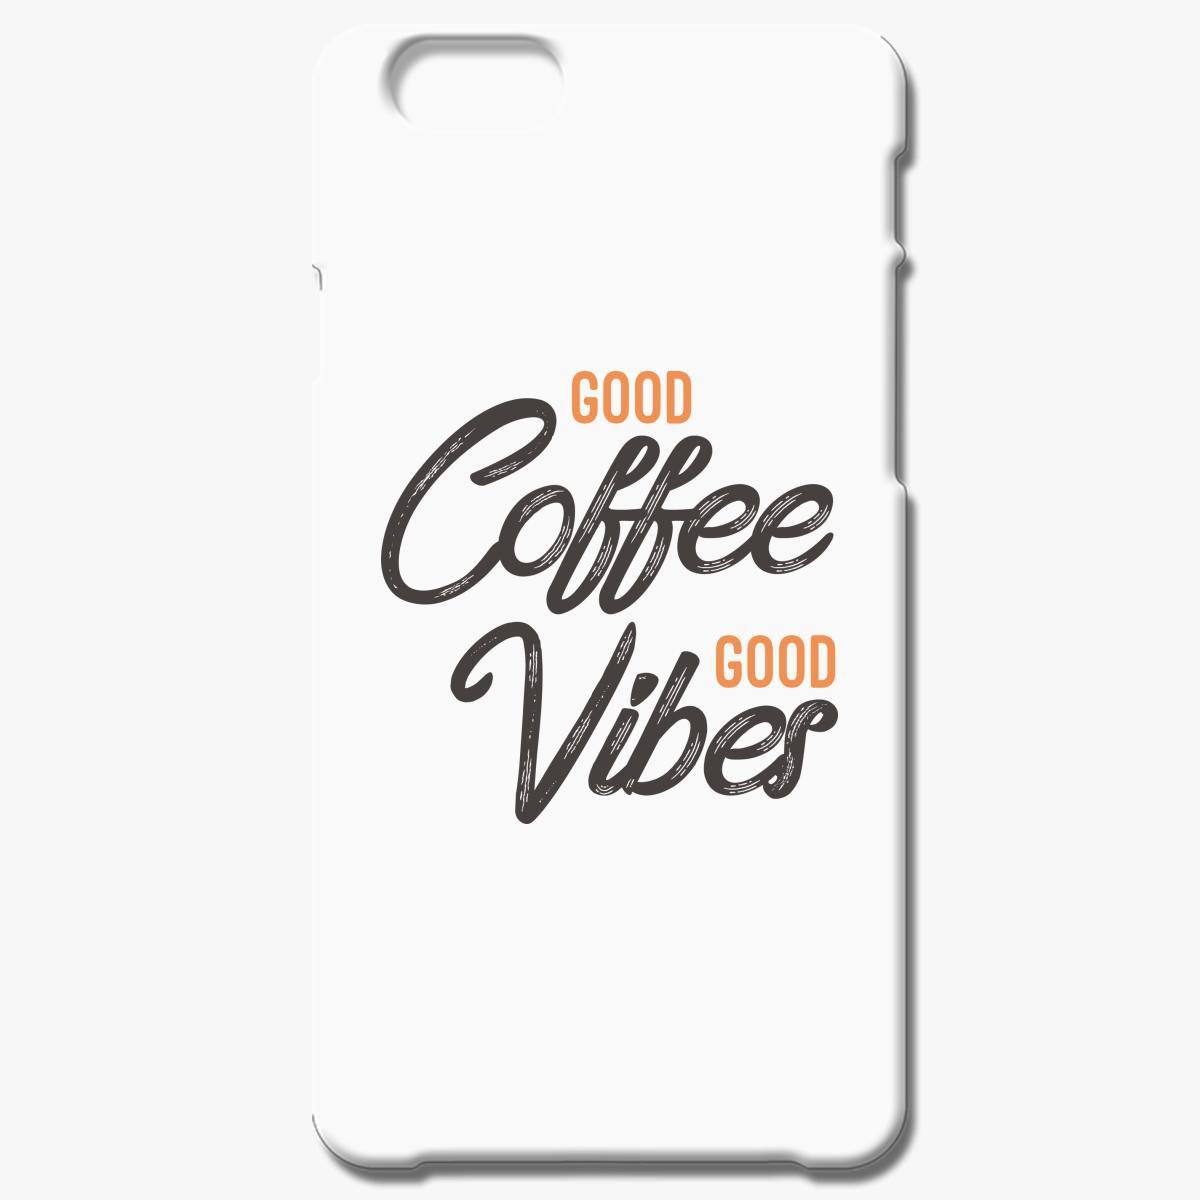 Good Coffee Good Vibes Iphone 6 6s Case